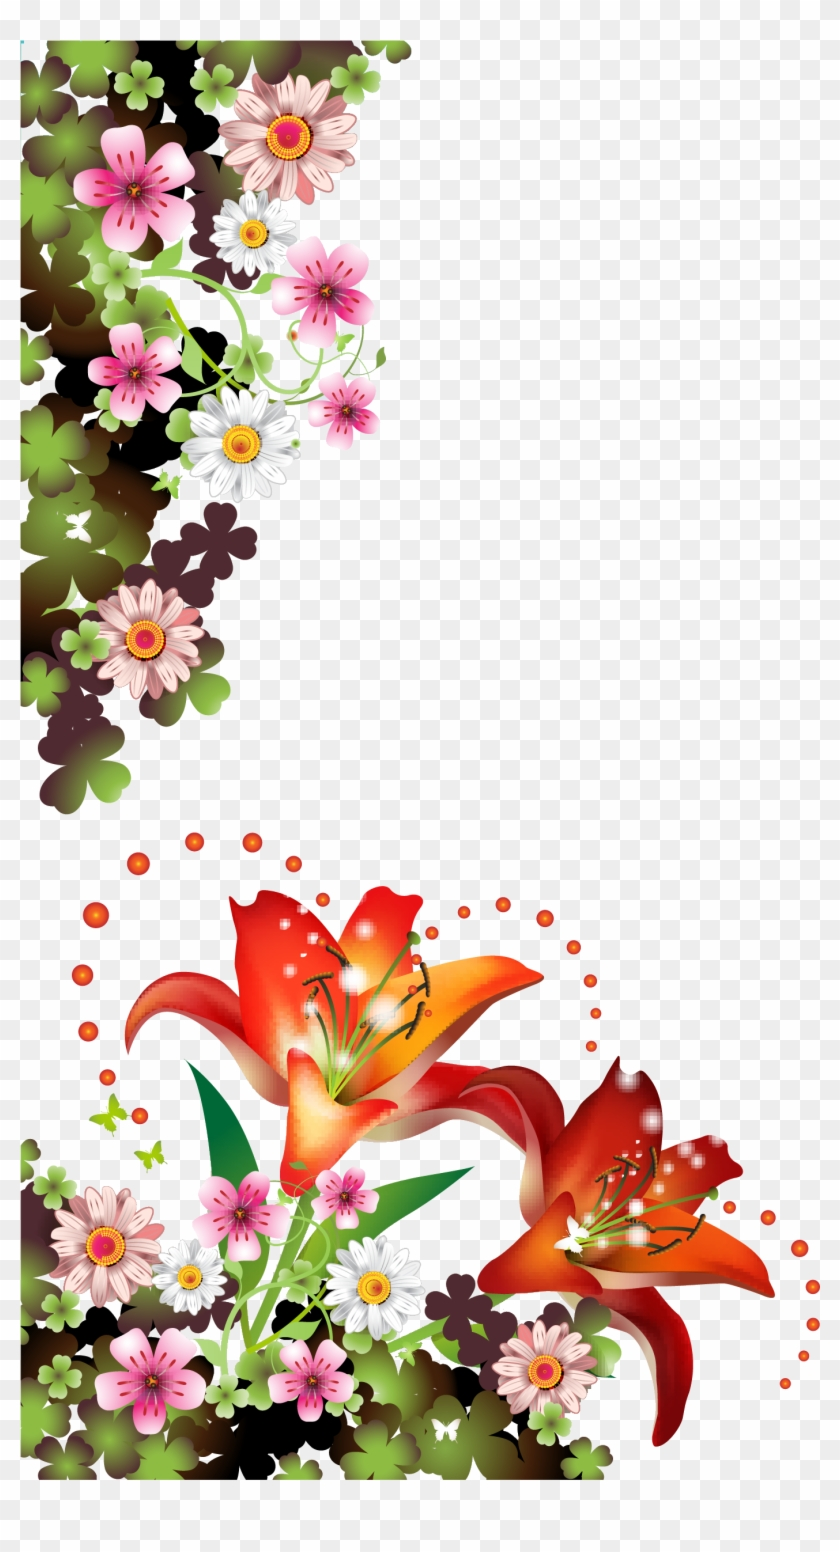 Picture Frames Flower Borders And Frames Floral Design - Picture Frames Flower Borders And Frames Floral Design #371443